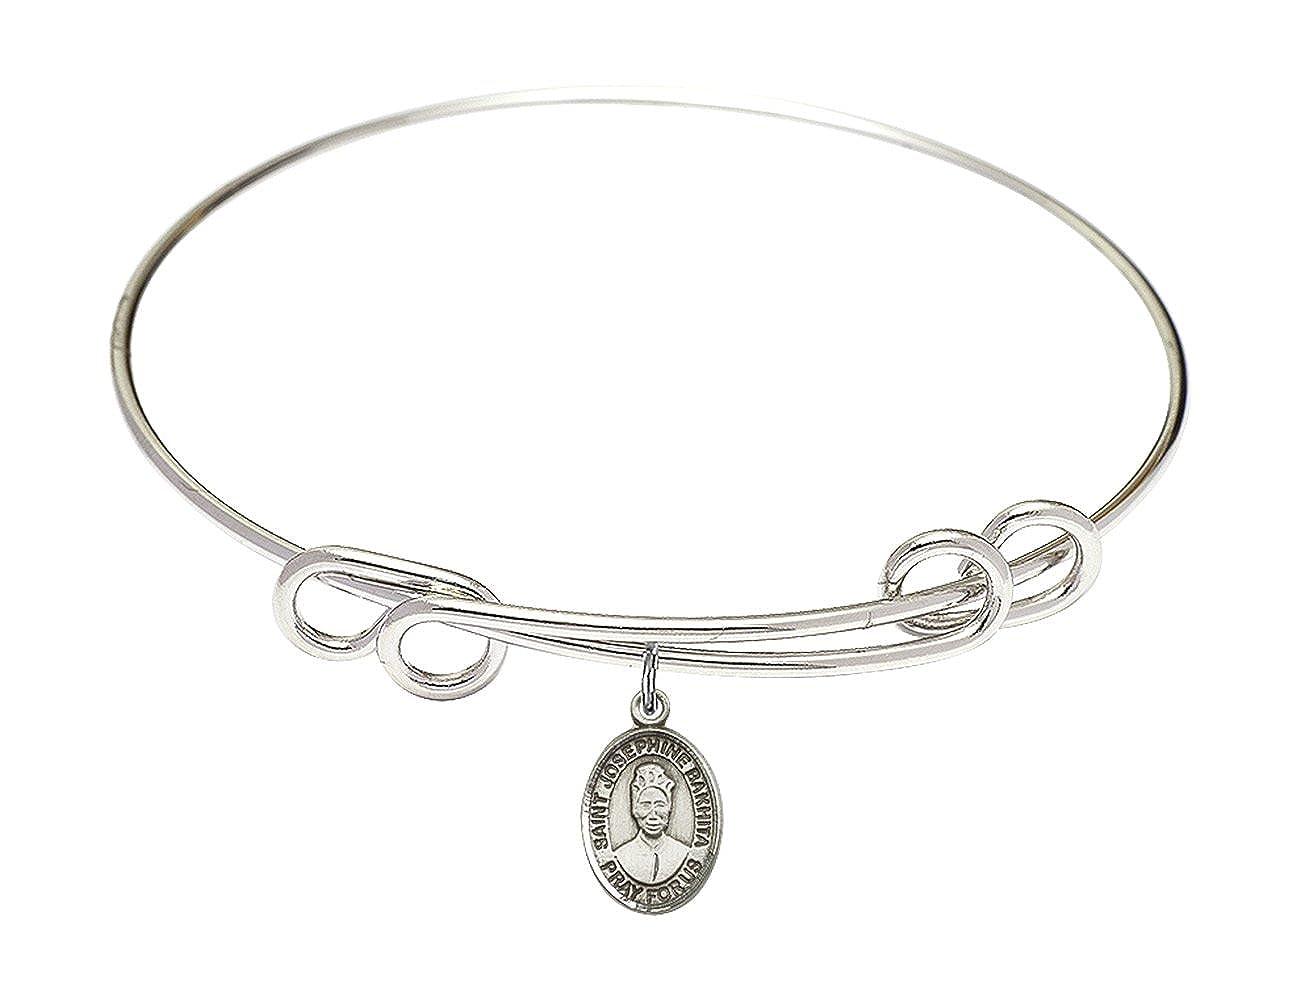 Josephine Bakhita in Sterling Silver Bonyak Jewelry Round Double Loop Bangle Bracelet w//St